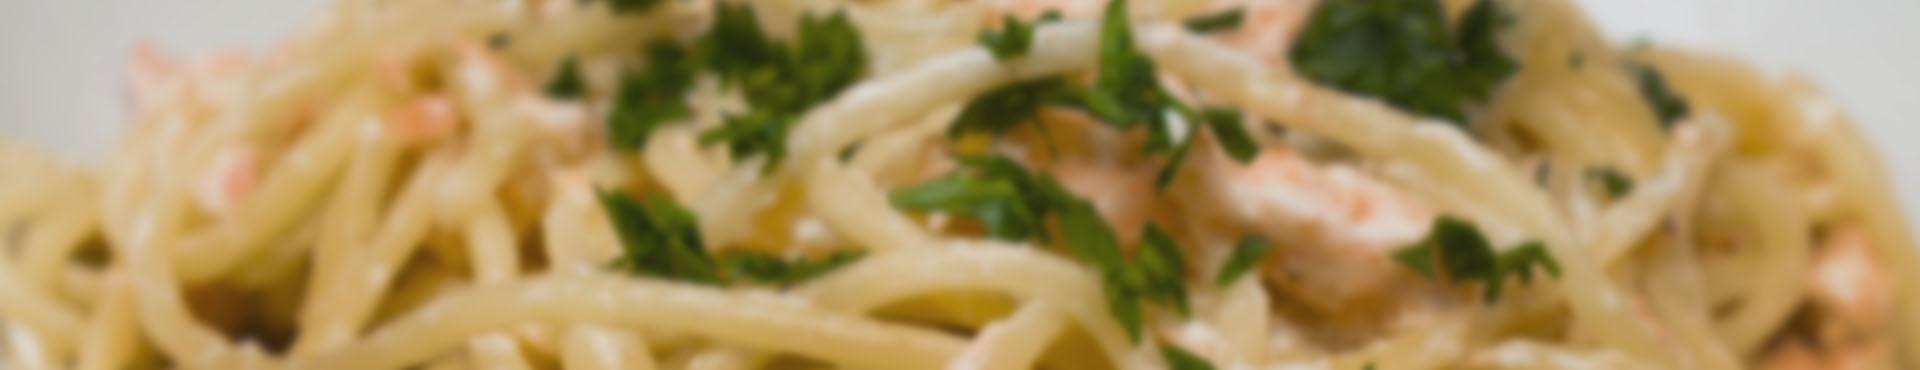 Omega Strong Spaghetti-bg